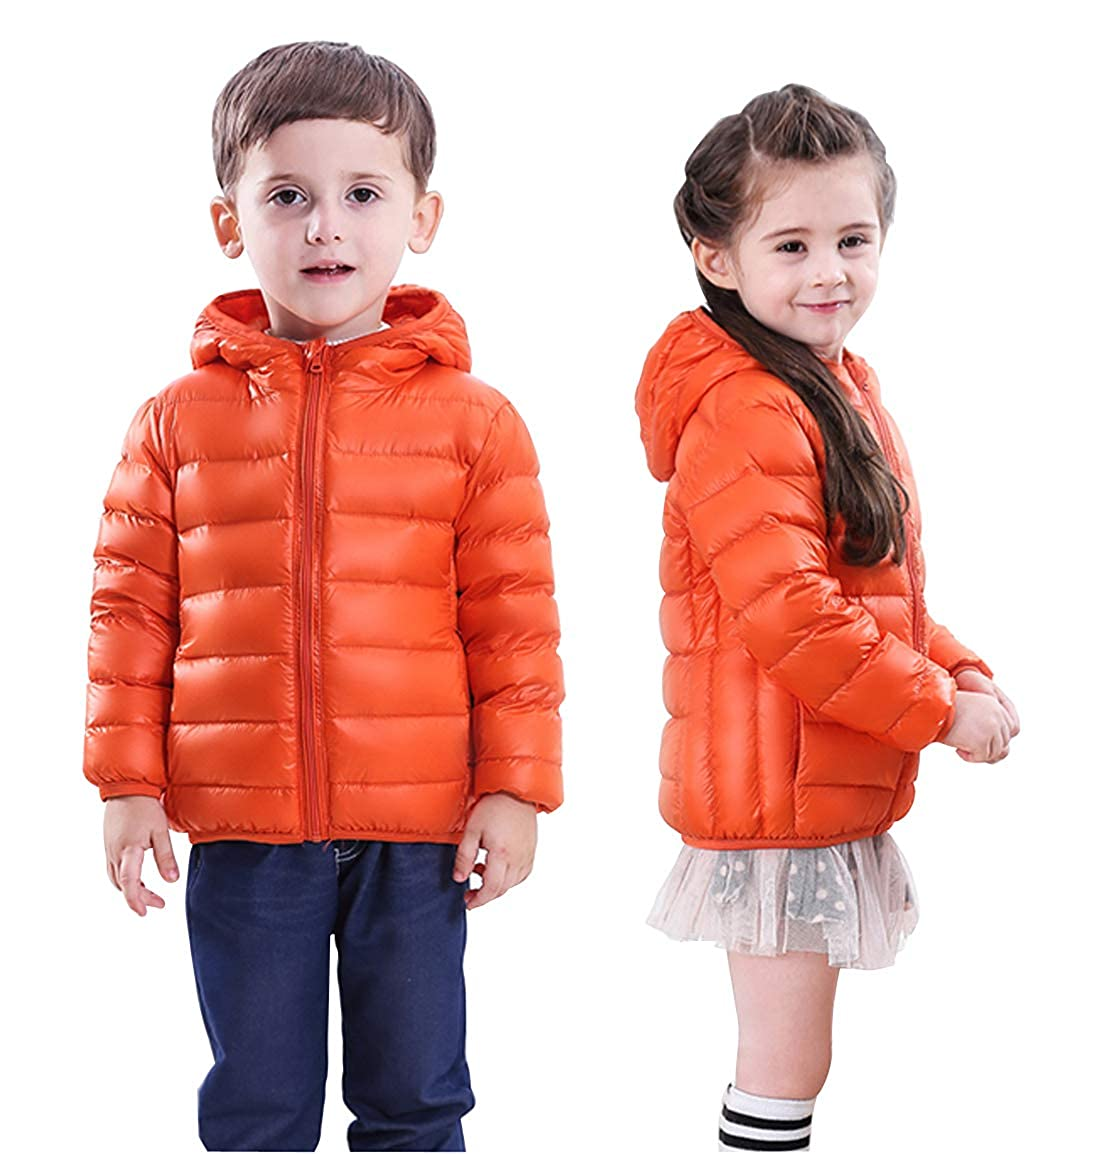 SHANGPIN Girl and Boy Winter Lightweight Waterproof Packable White Duck Down Hooded Jacket